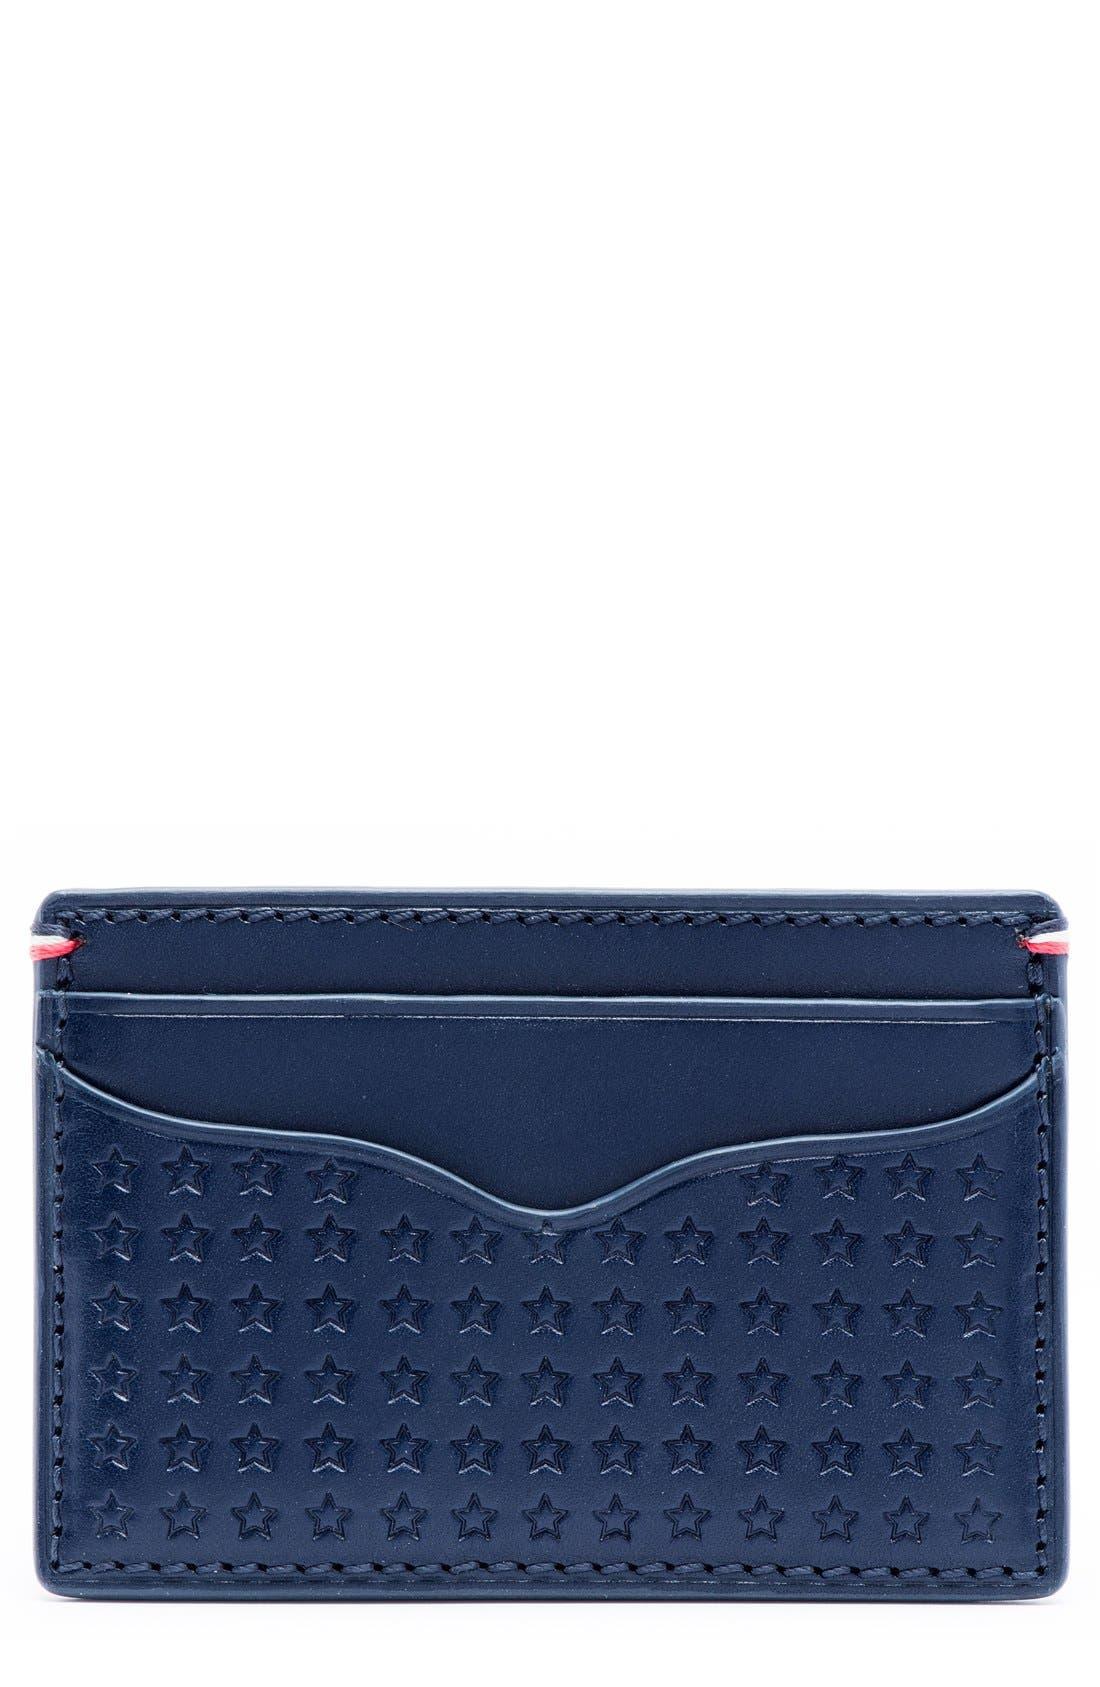 Alternate Image 1 Selected - Jack Mason Star Leather Card Case